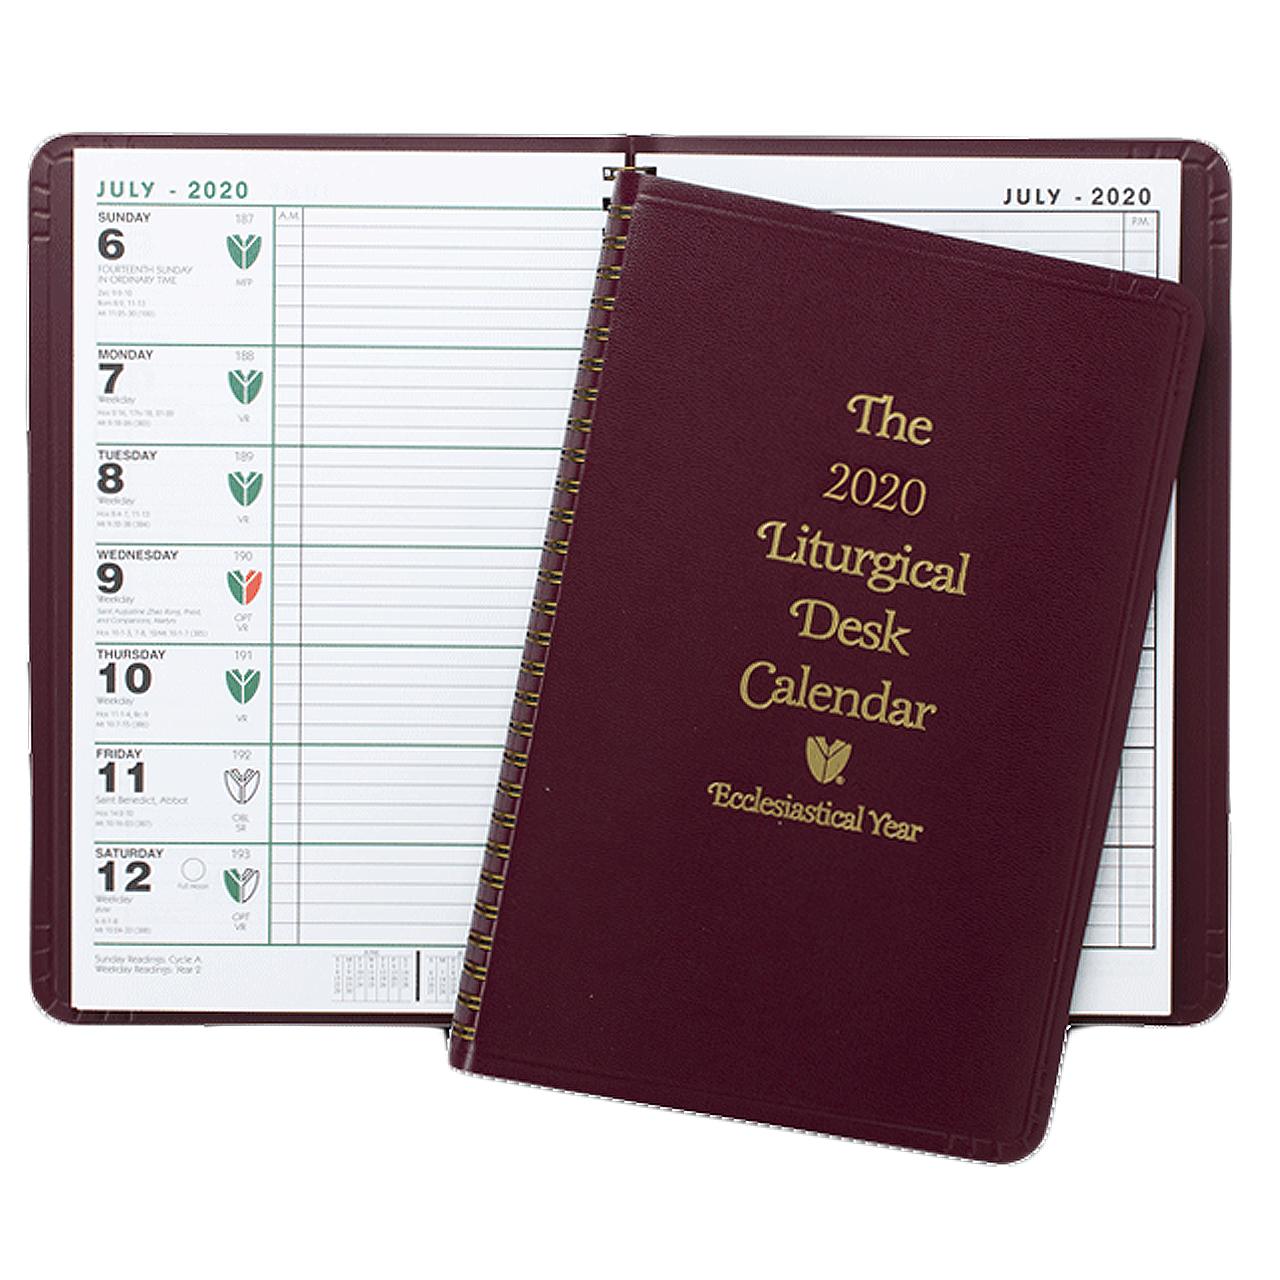 2020 Liturgical Desk Calendar 2020   Liturgical Desk Calendar   Ecclesiastical   Spiral Bound